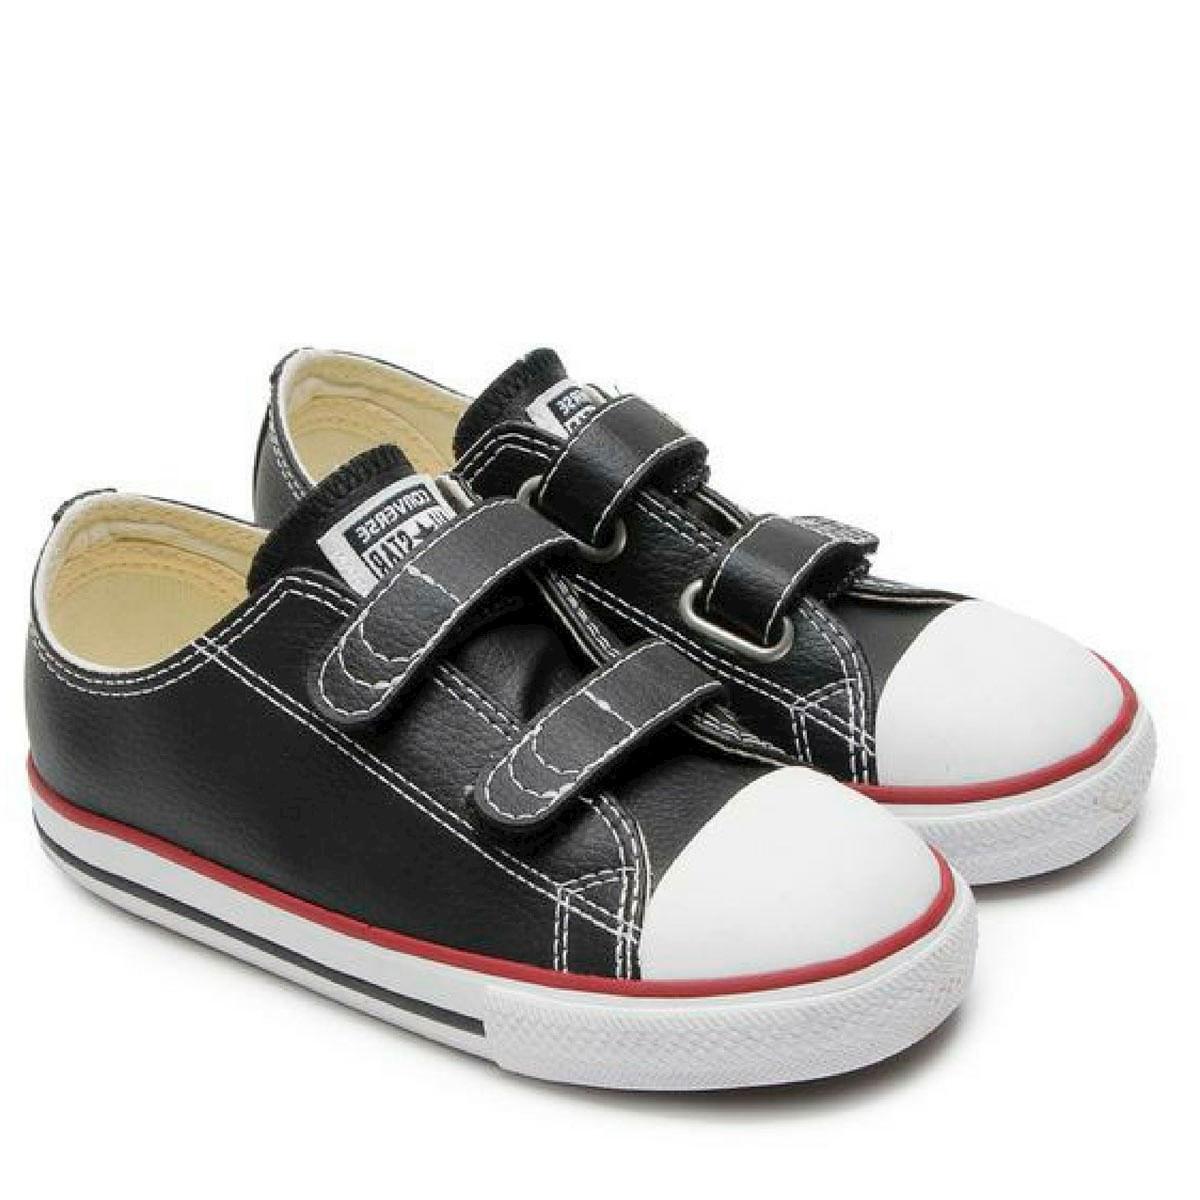 Tenis-Infantil-Chuck-Taylor-AS-2V-SCHOOL-Converse--18-ao-25-